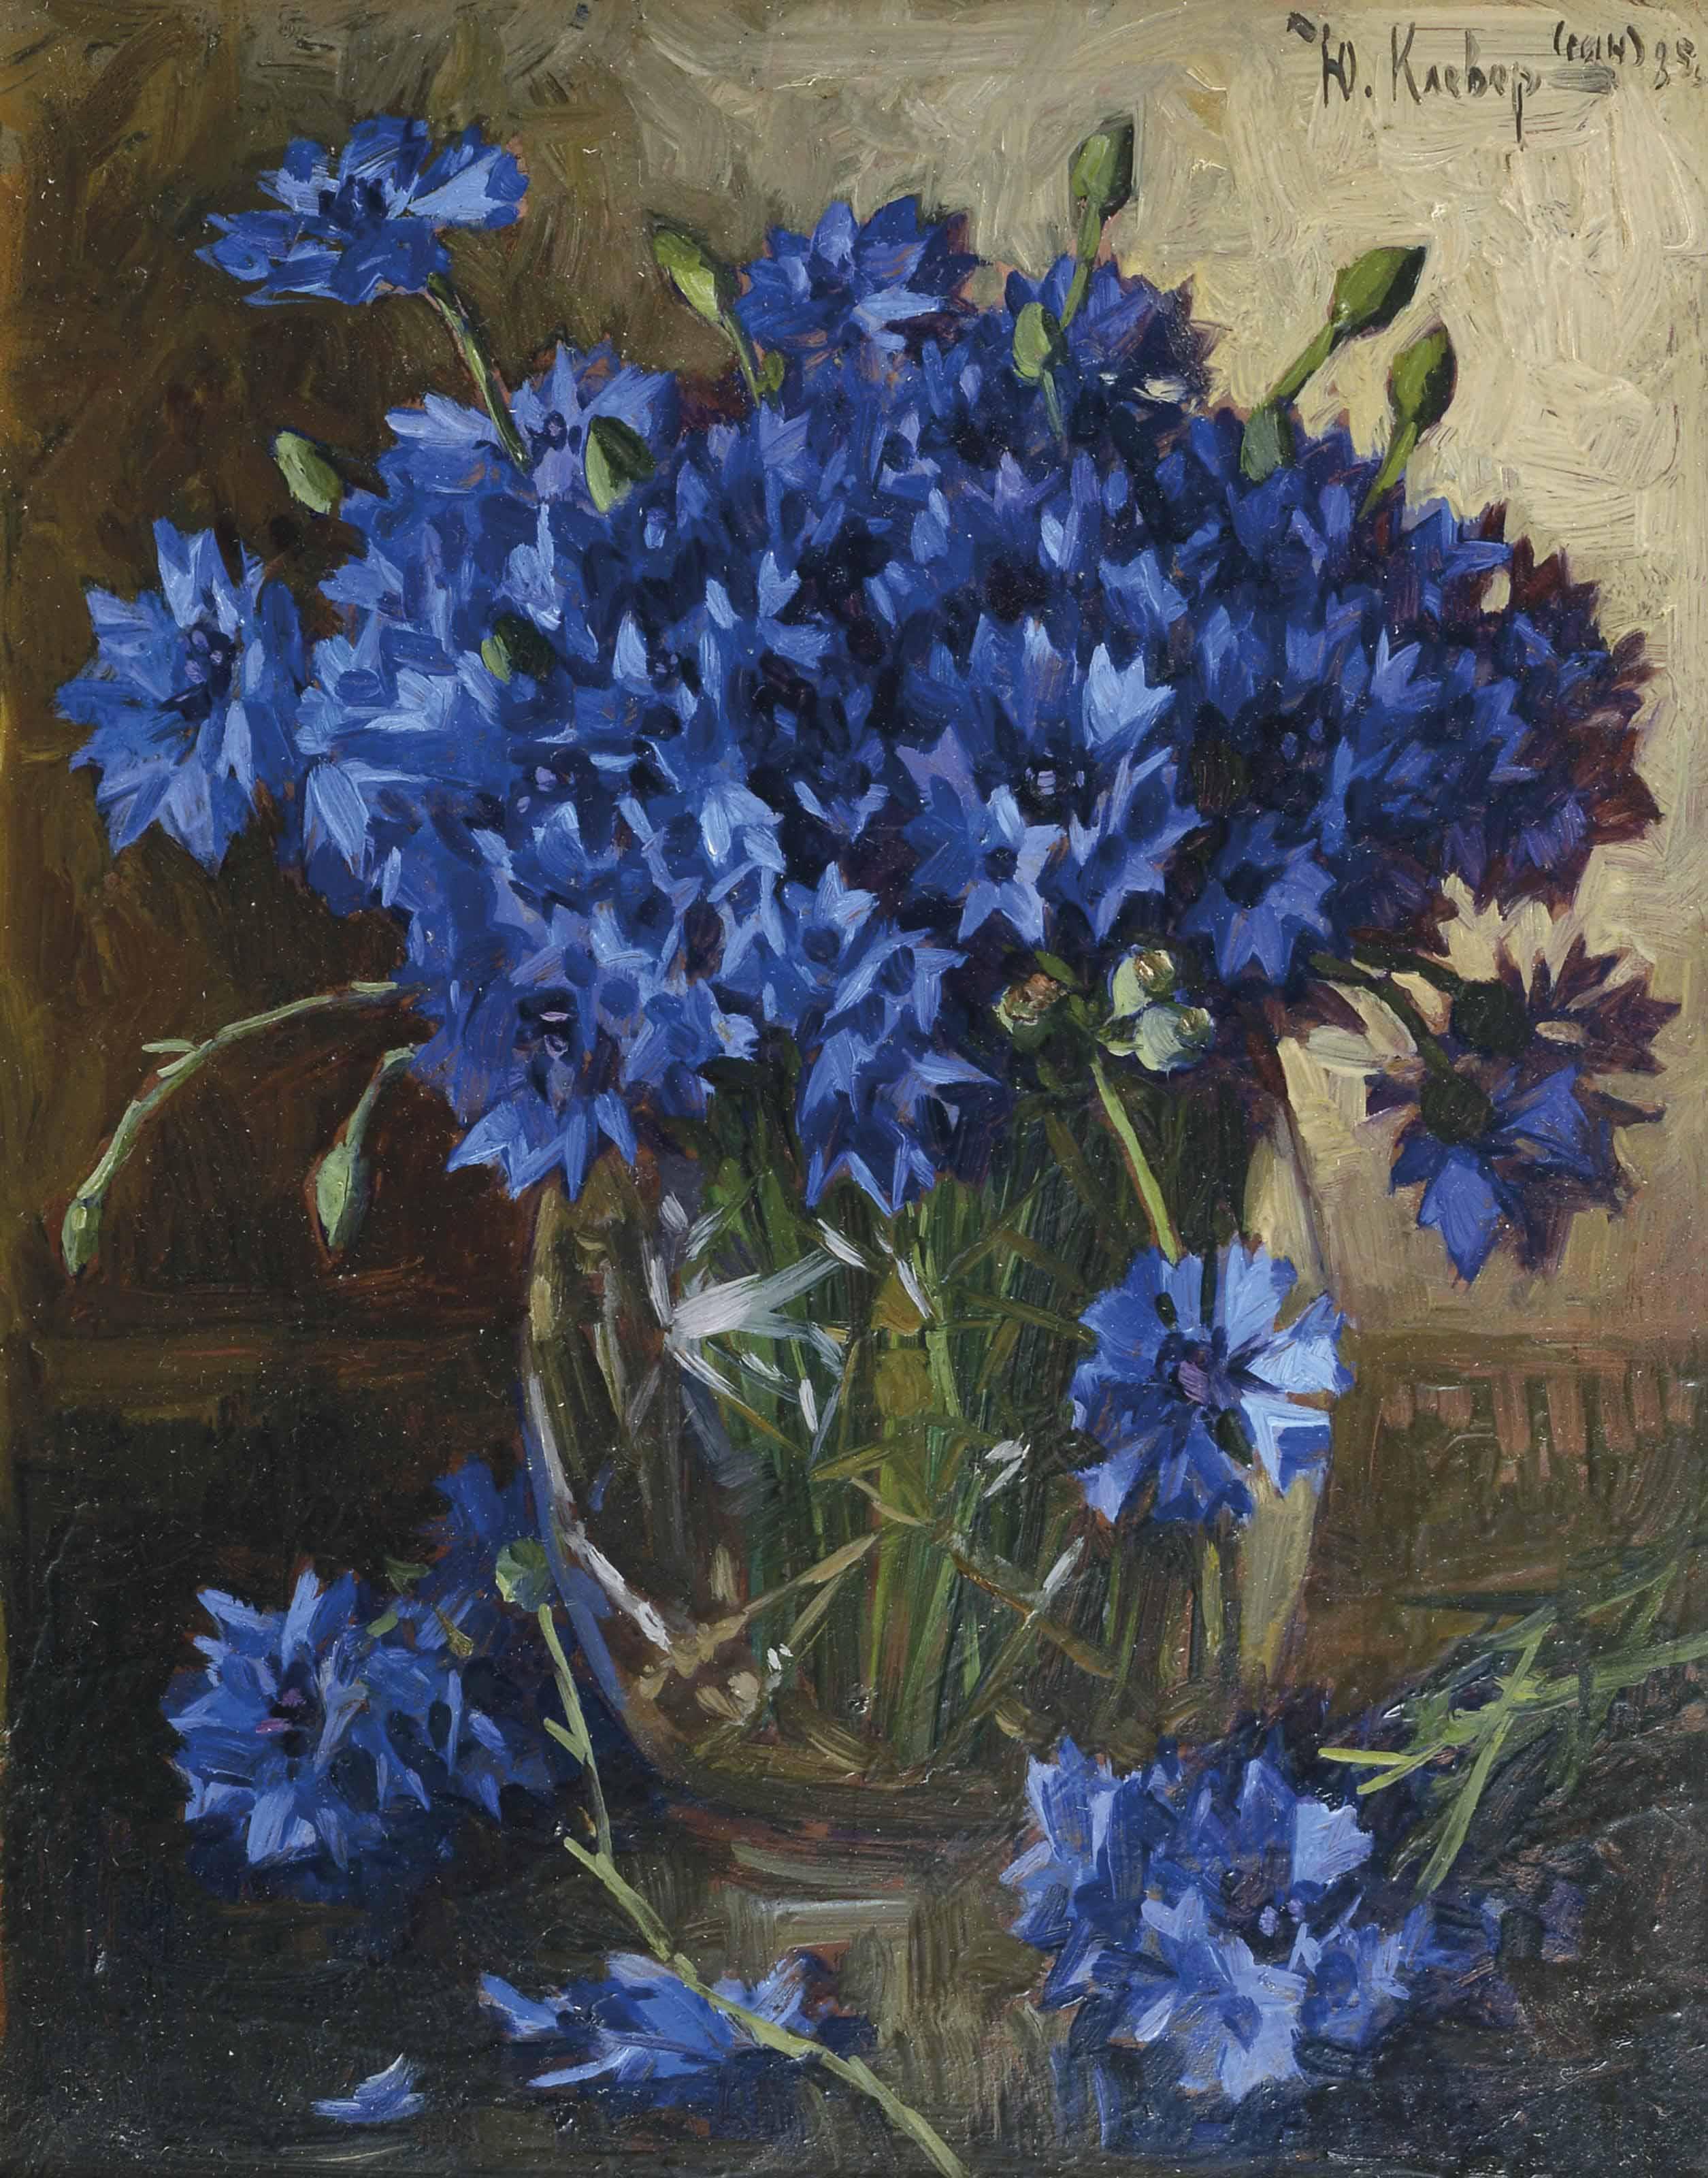 A bouquet of cornflowers